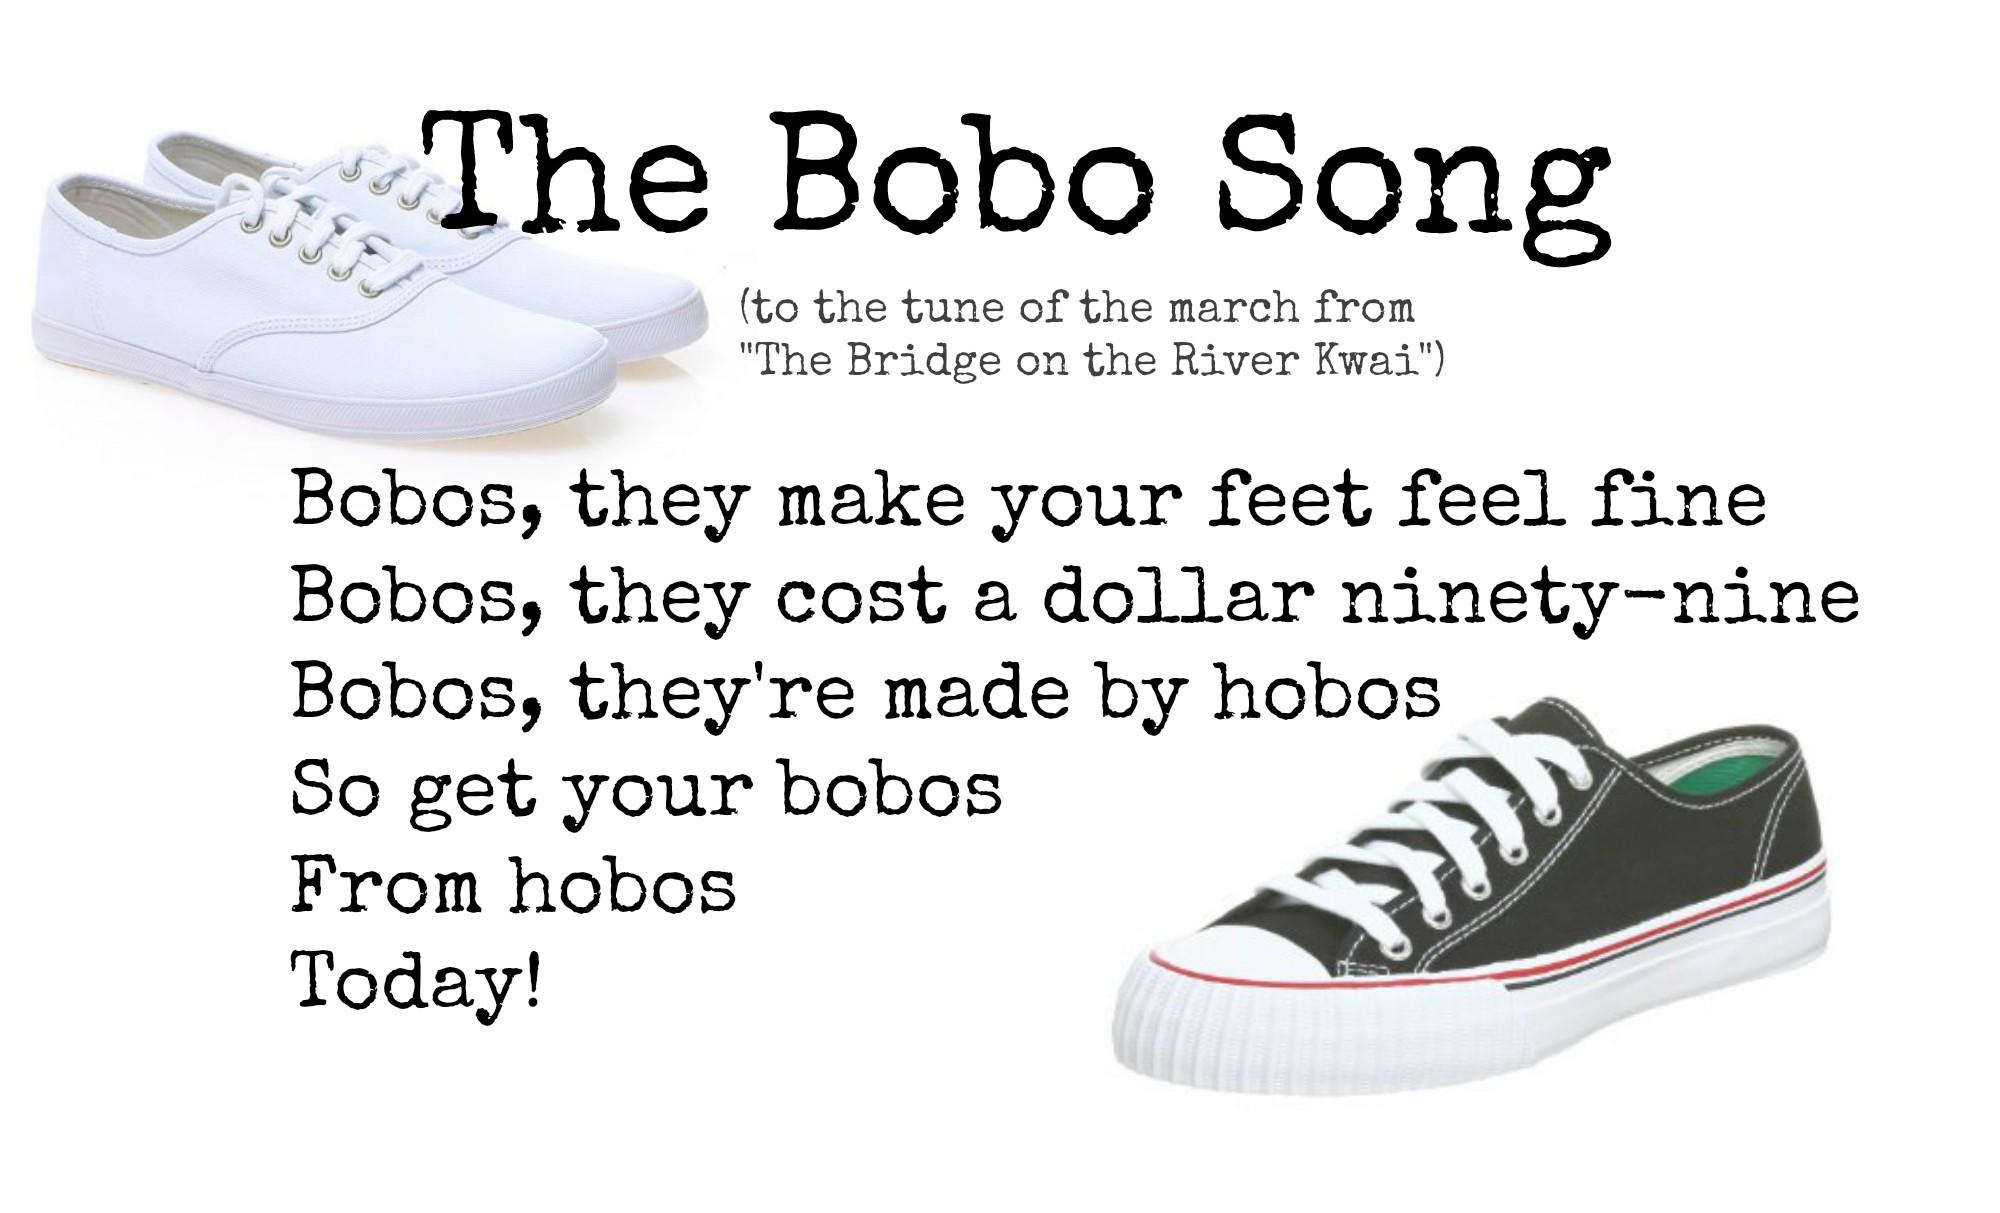 East Falls Local bobo song